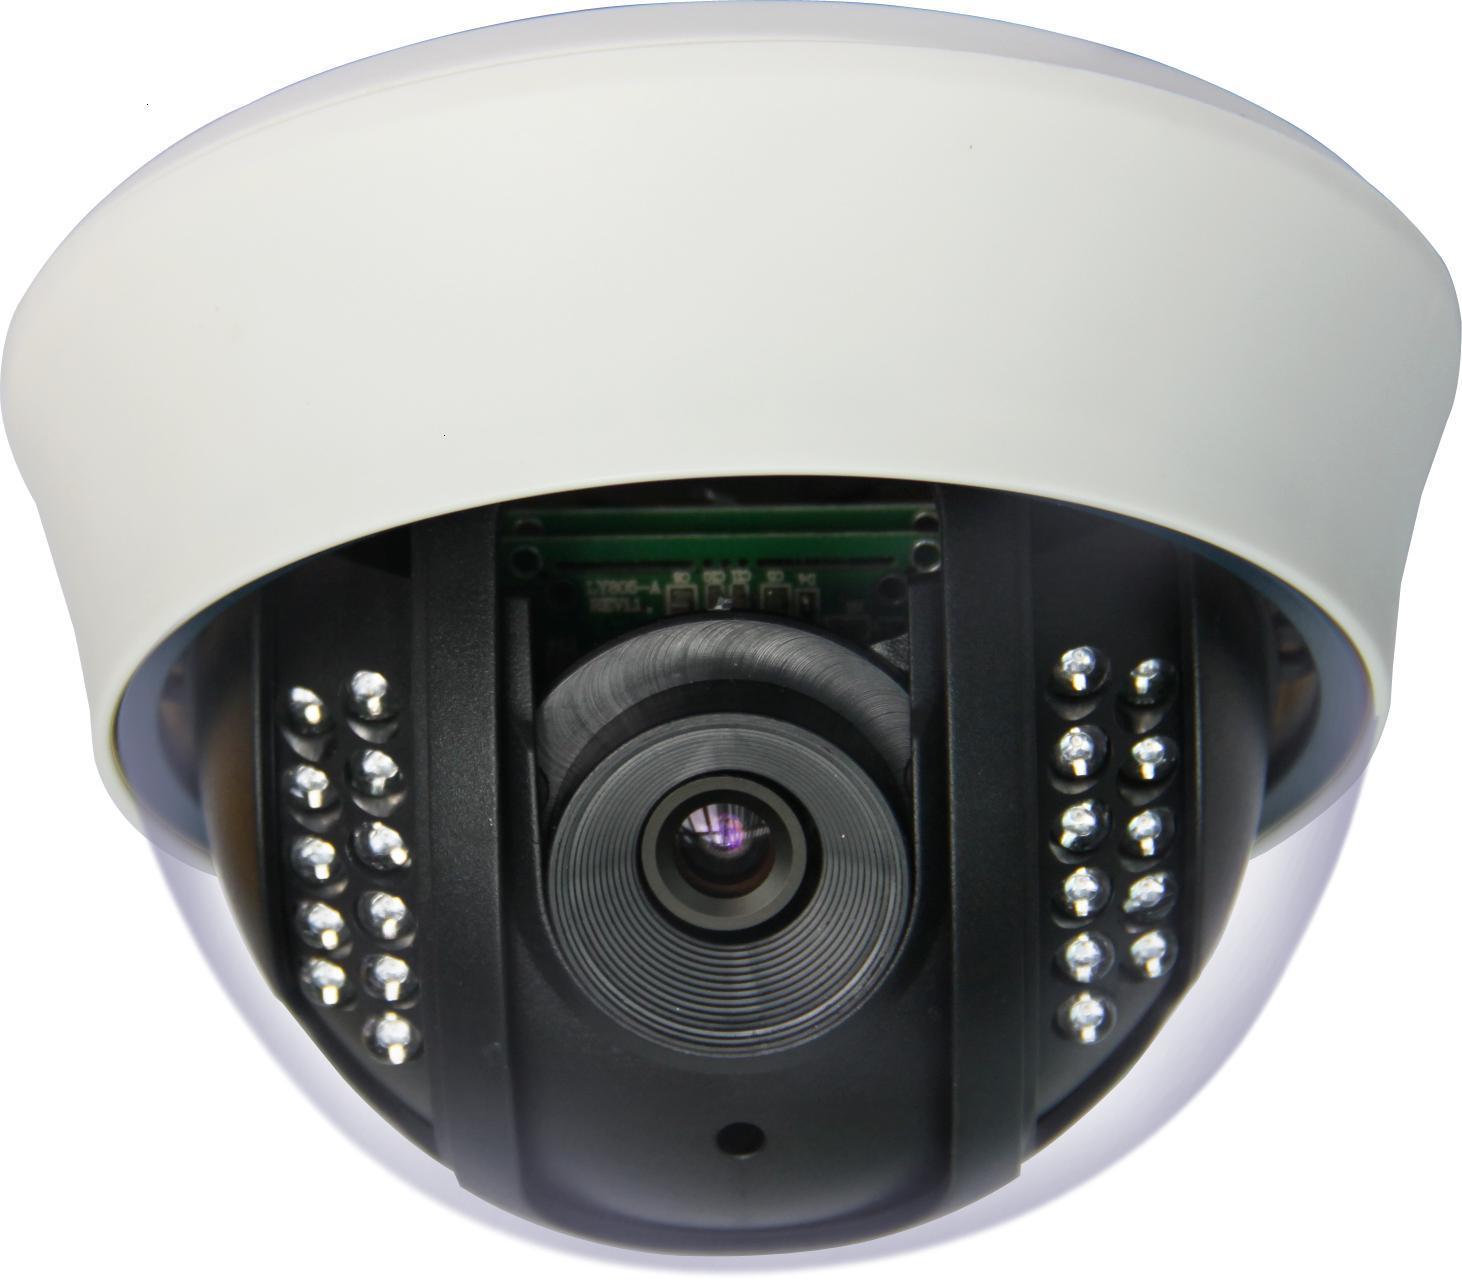 ryfutone co ltd provide professional camera including sony fcb ex zoom color module camera. Black Bedroom Furniture Sets. Home Design Ideas